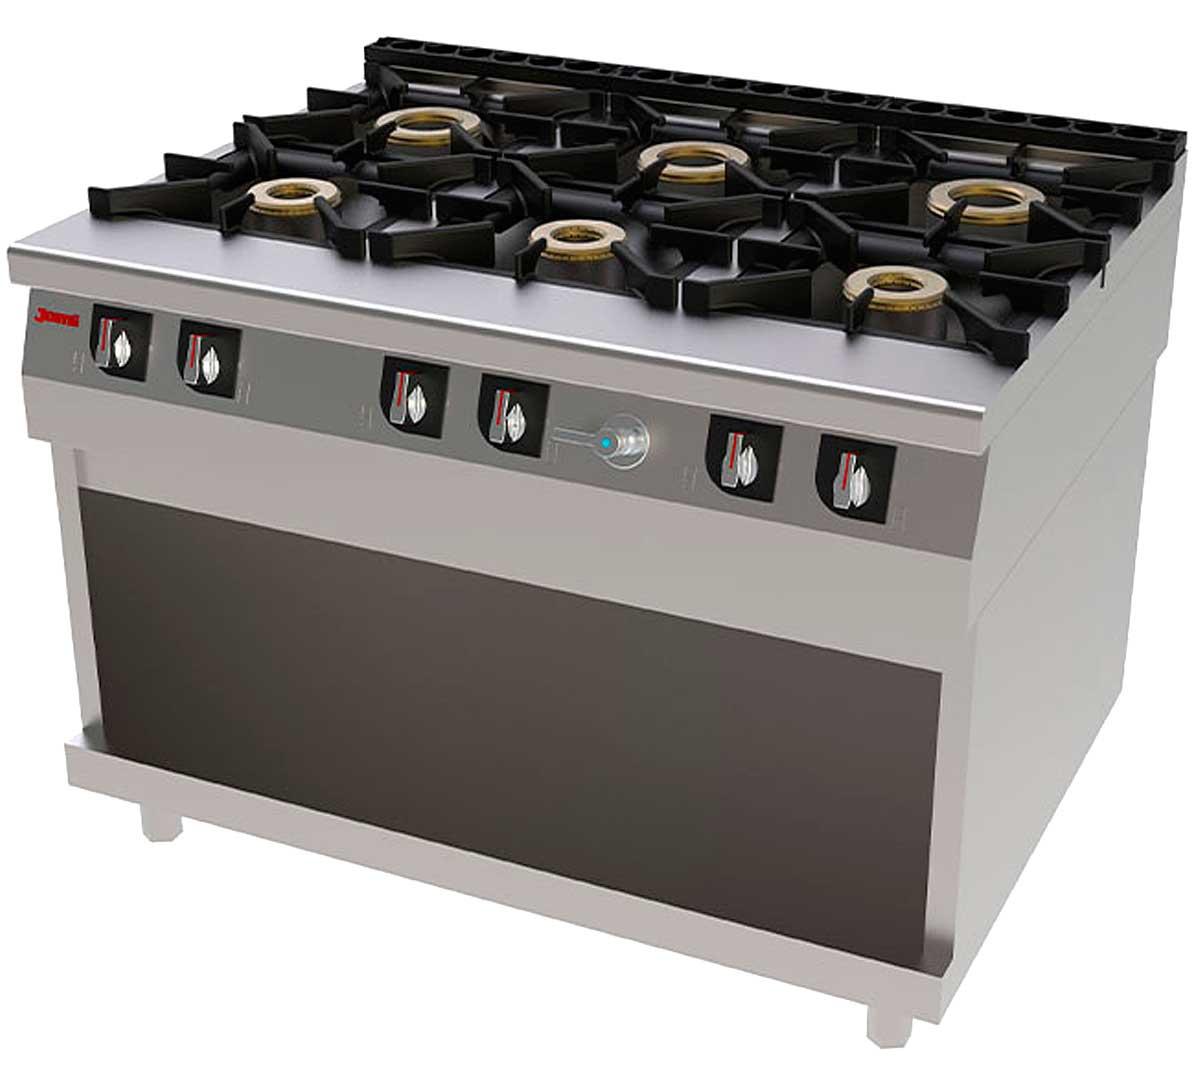 Cocina jemi serie 900 chef - Cocinas butano carrefour ...